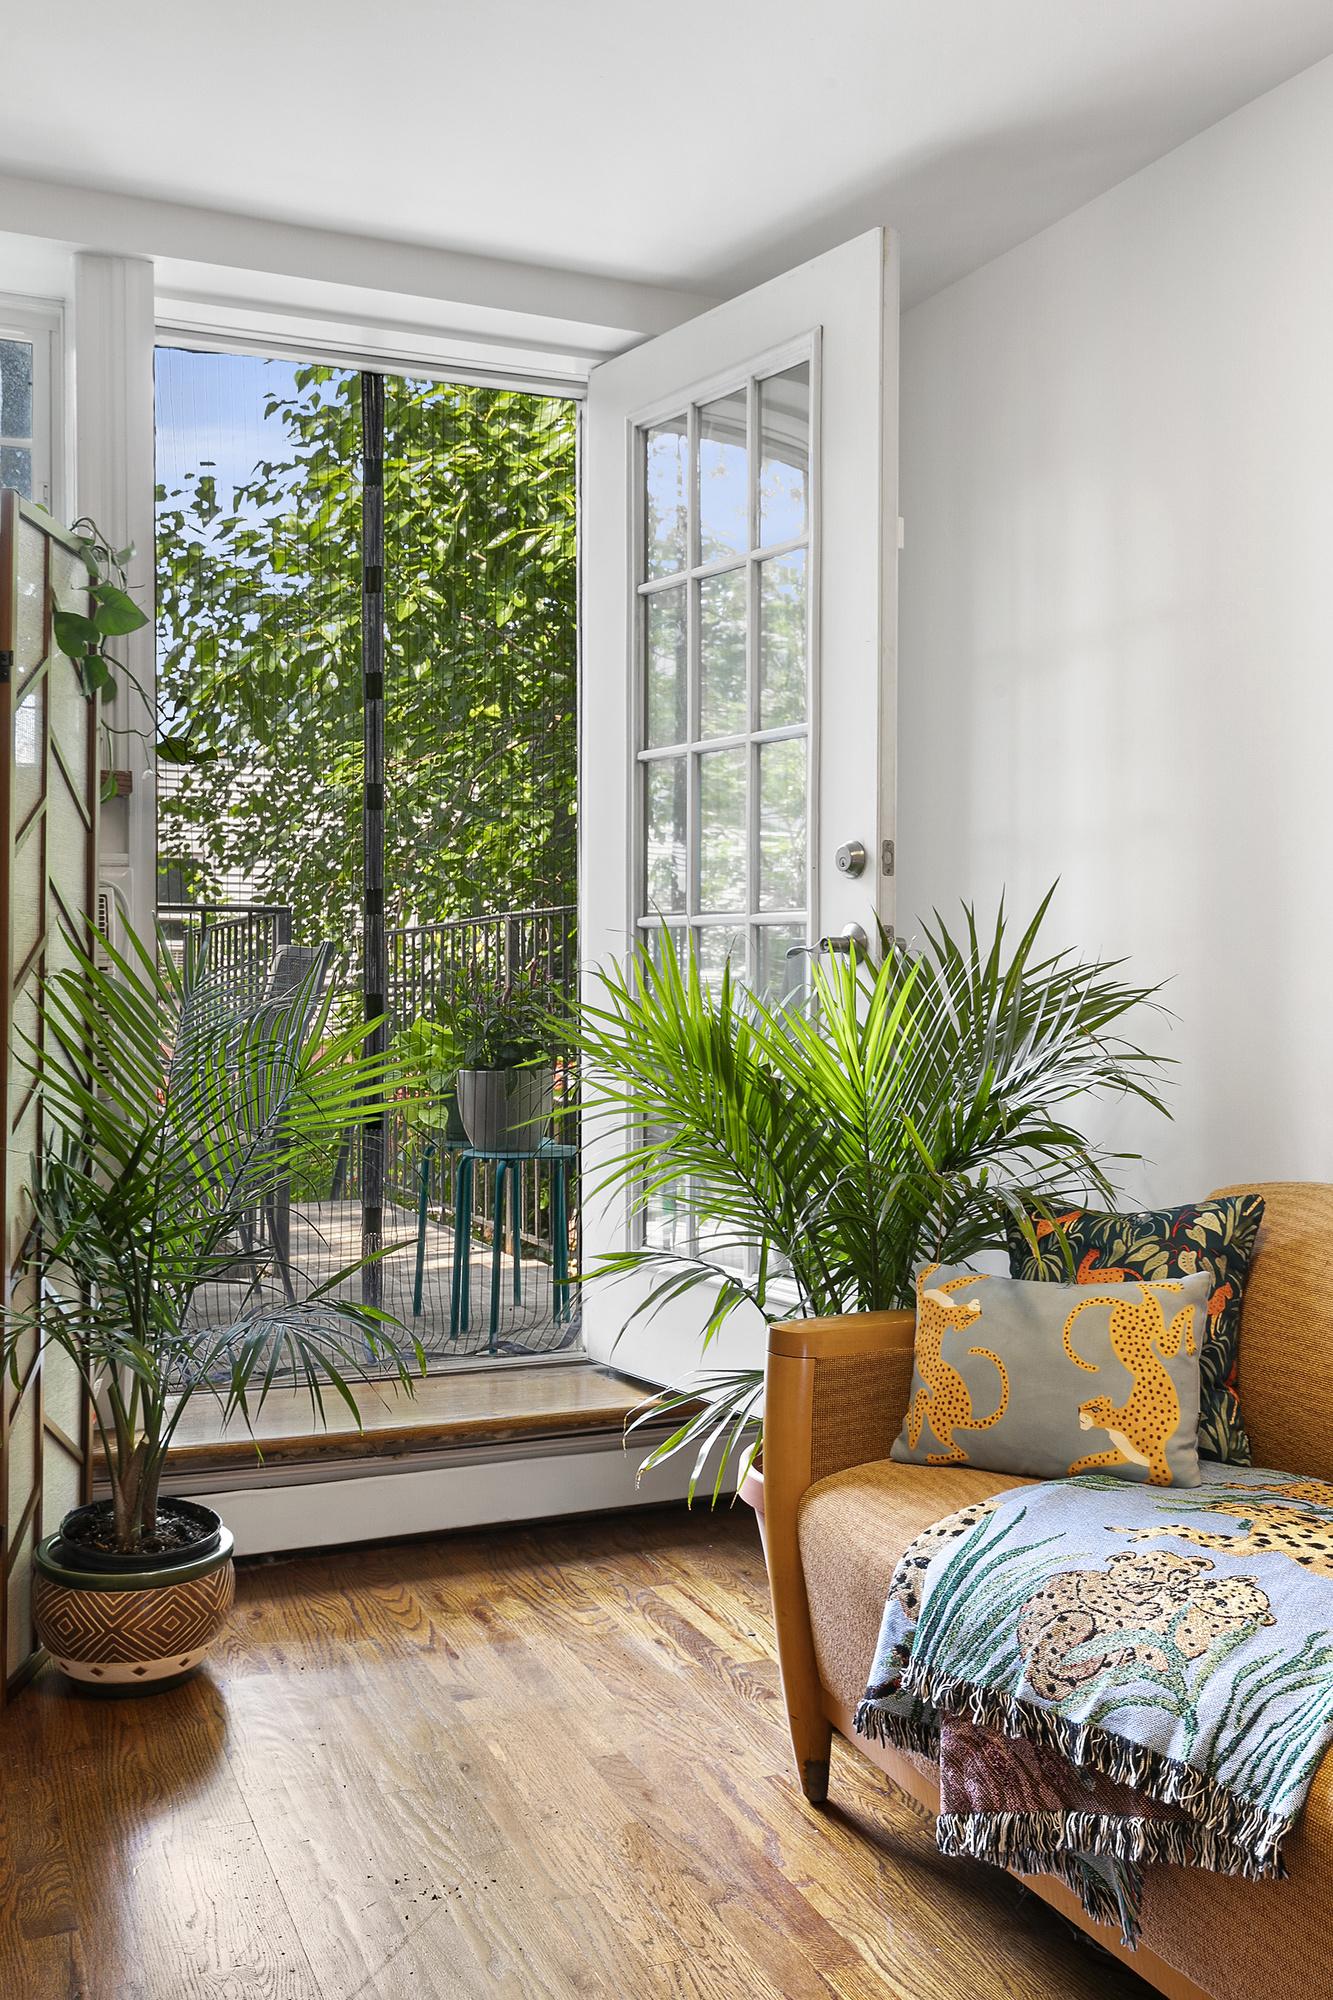 499 Quincy Street Bedford Stuyvesant Brooklyn NY 11221